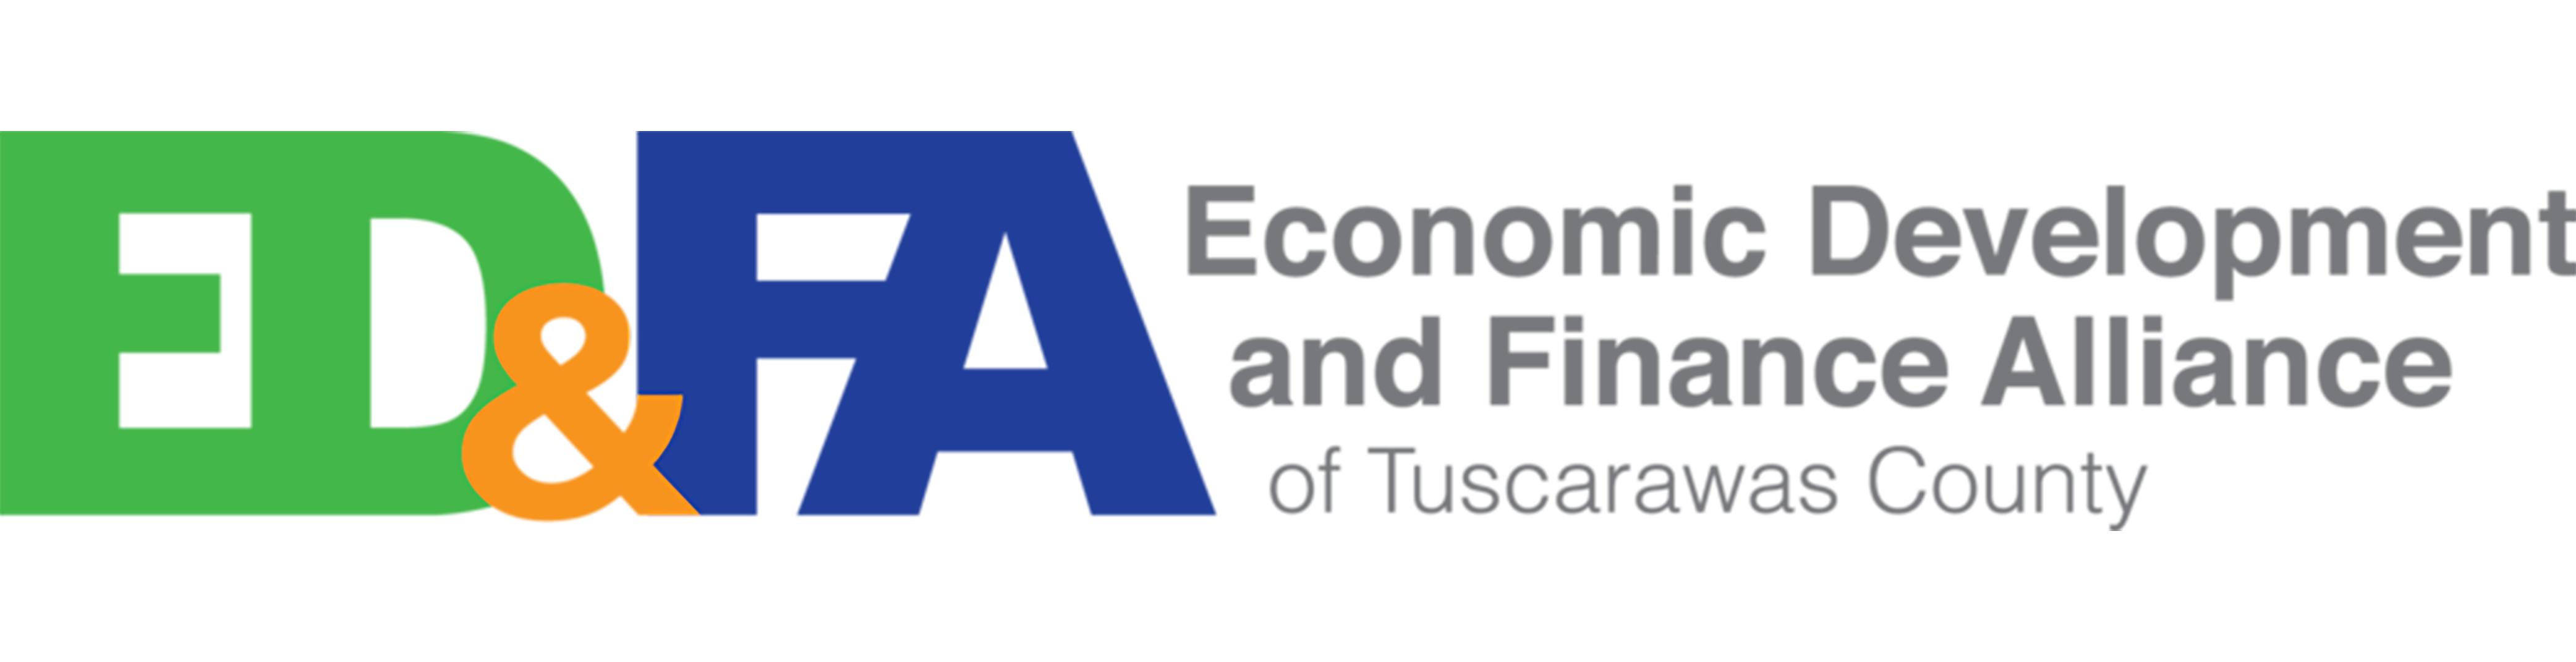 Visit Economic Development and Fiance Alliance's website